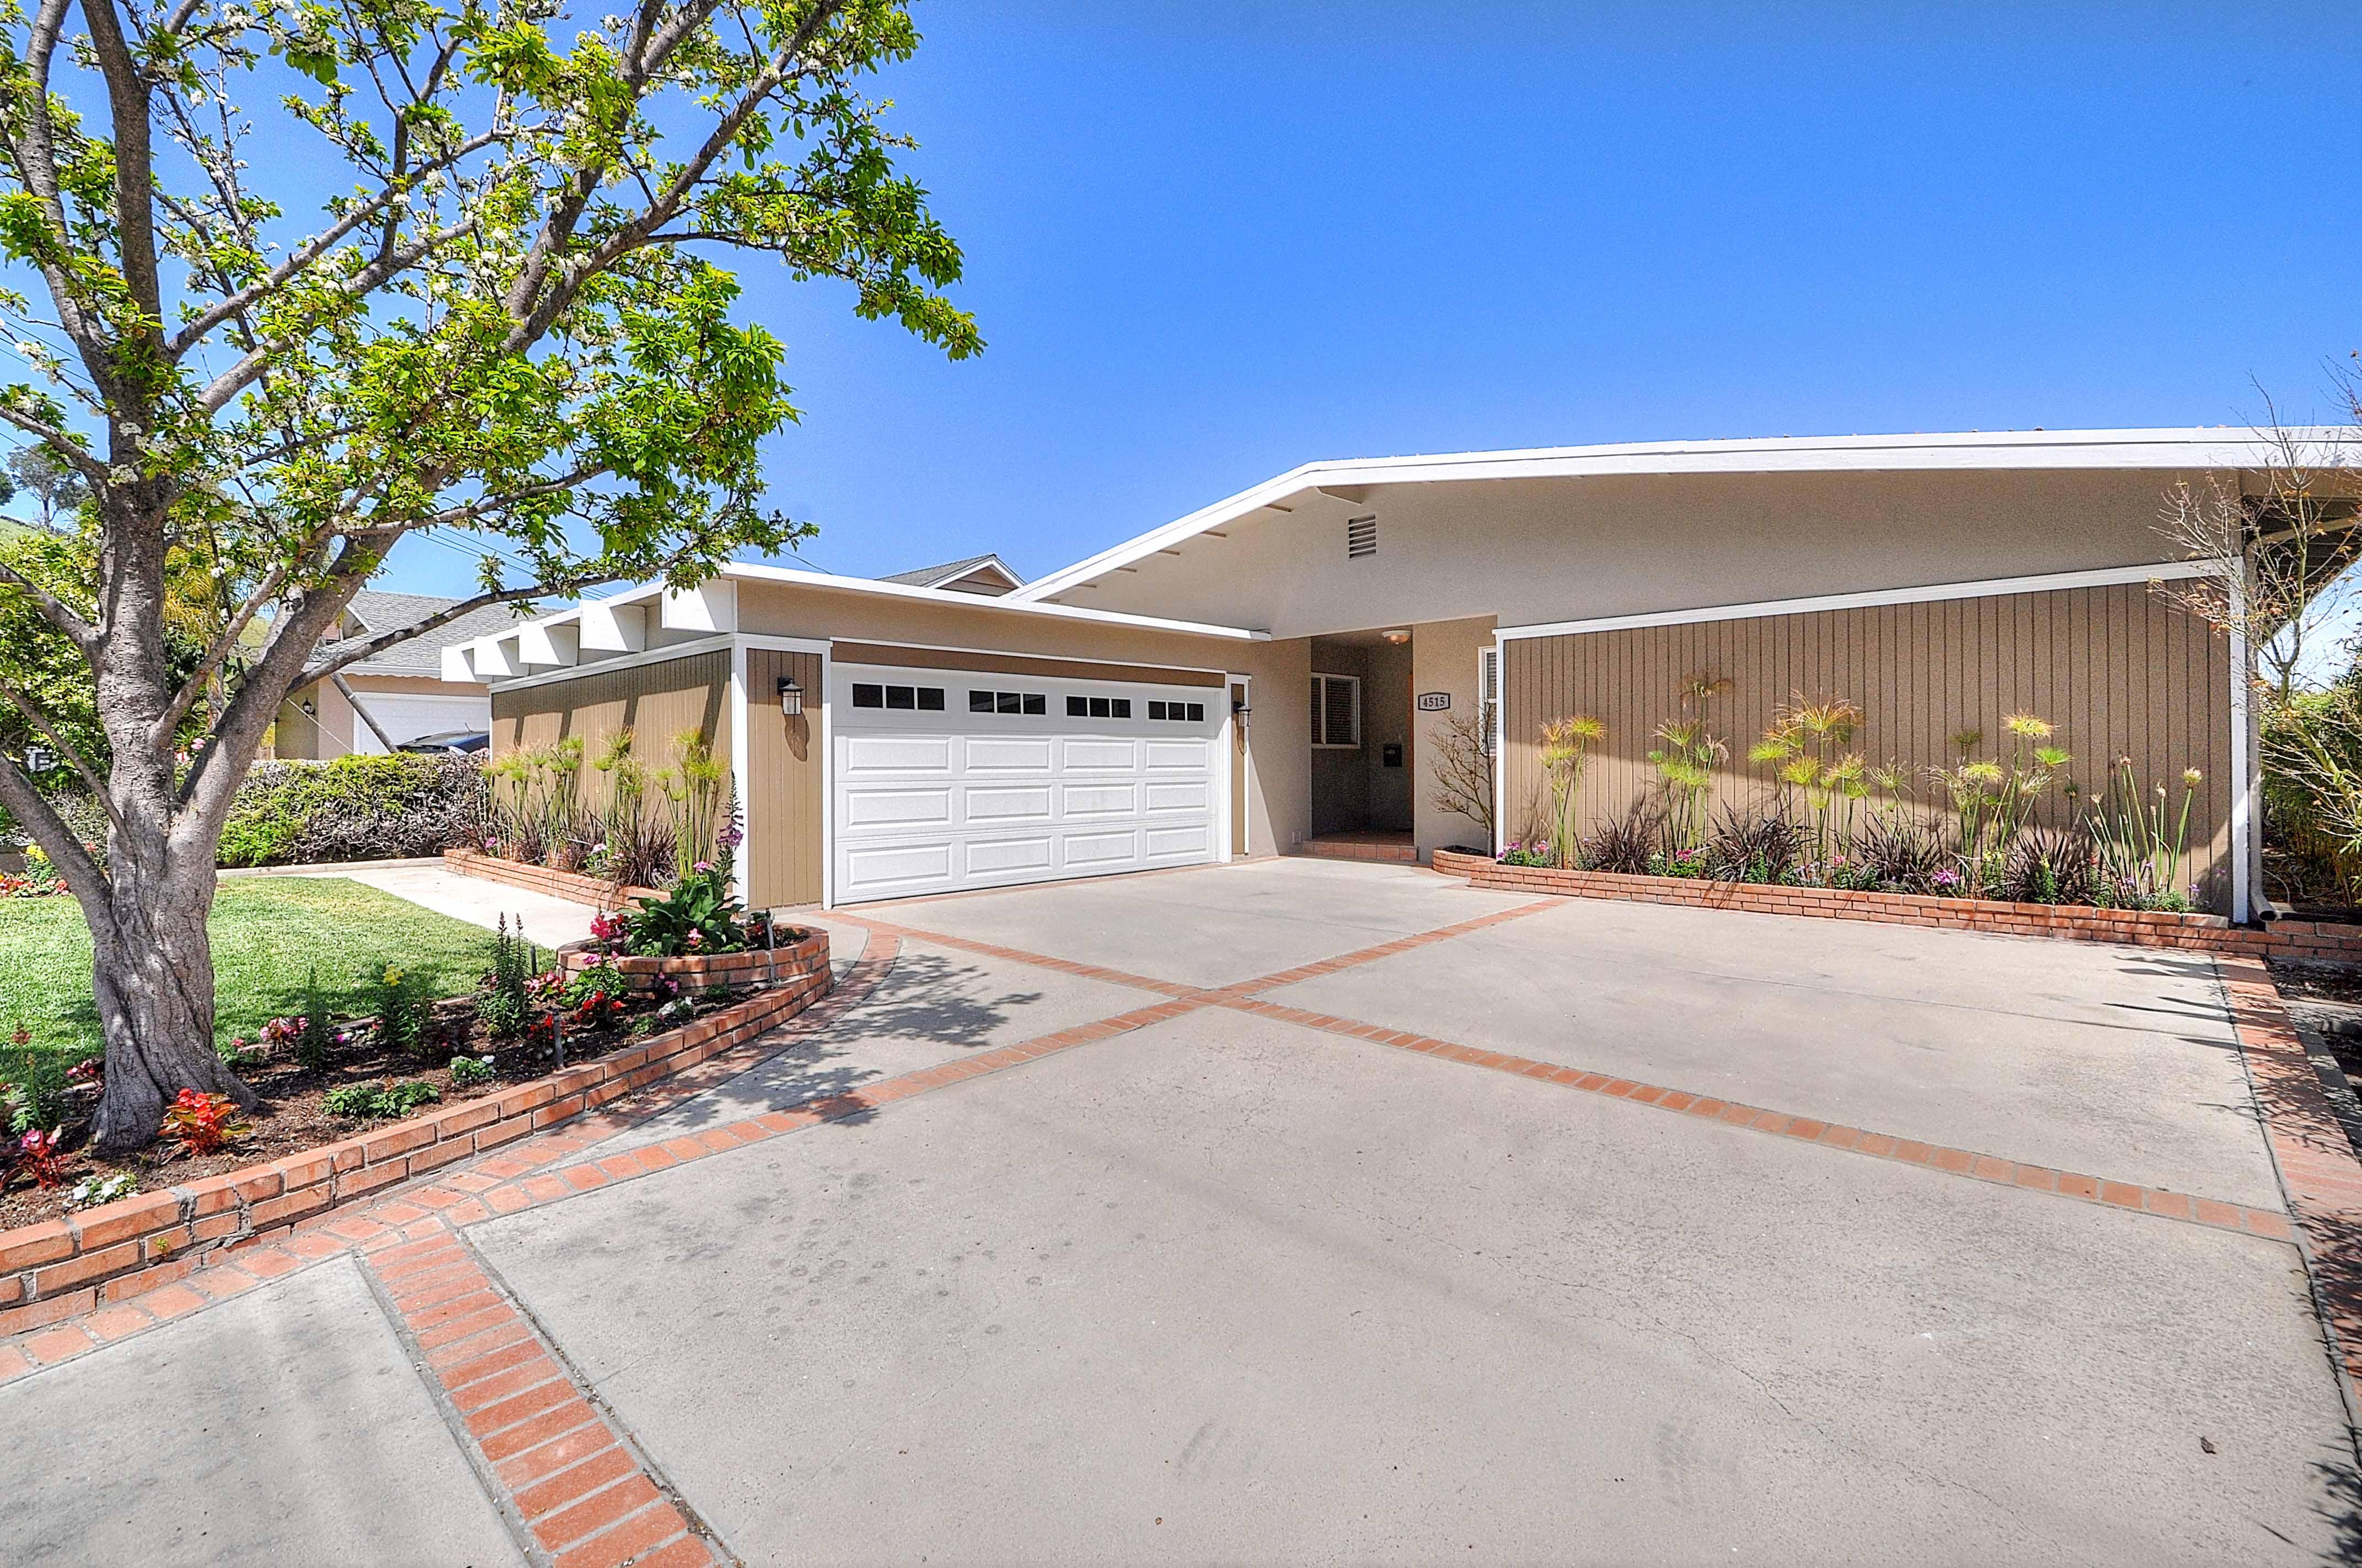 4515-Vista-Largo-front-of-house4-Copy